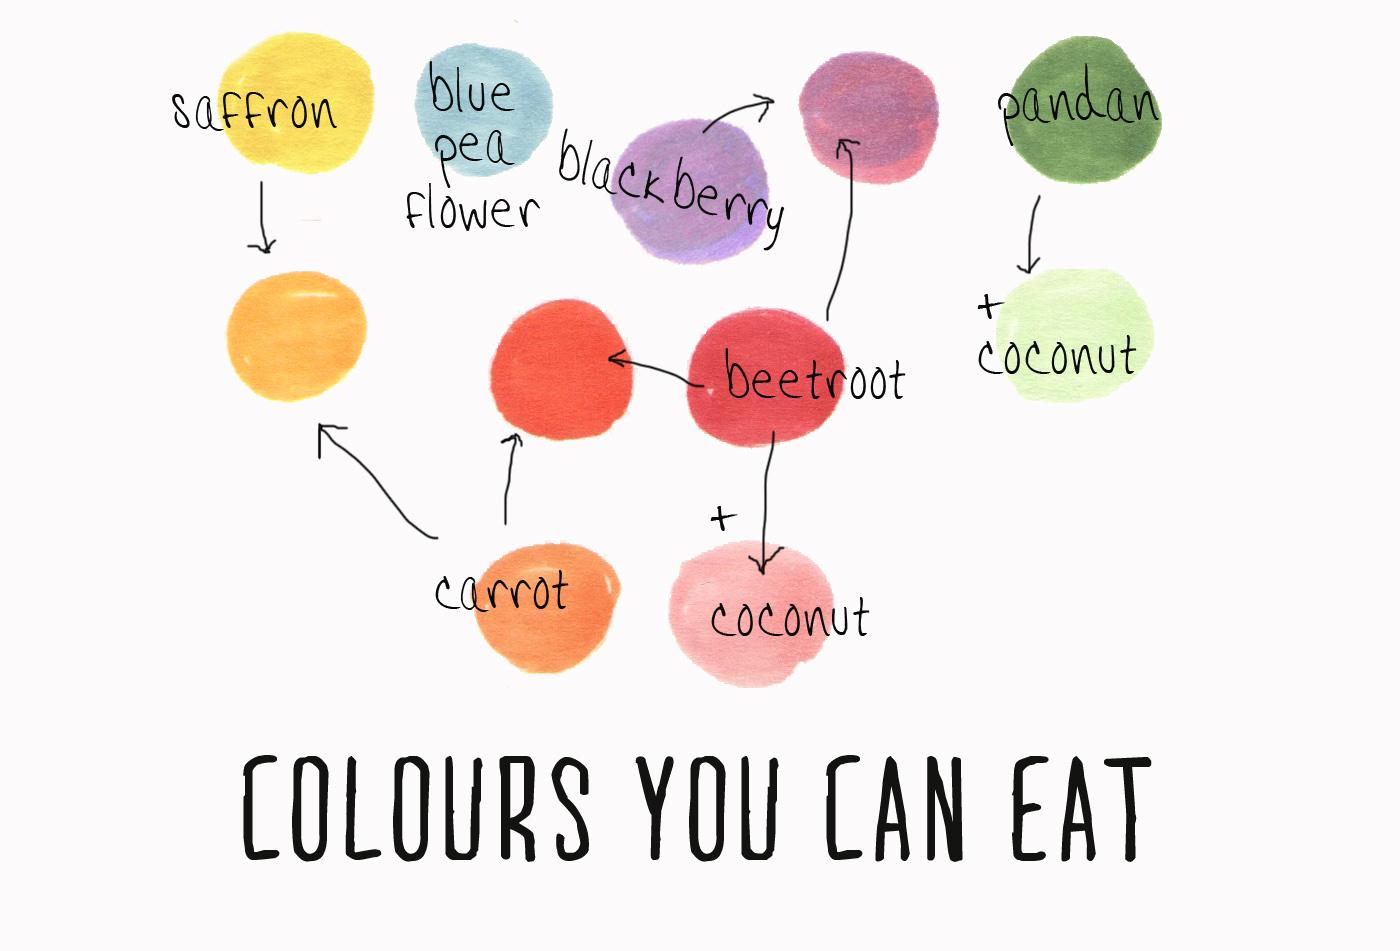 Mummy, I can cook!: Naturally coloured Agar Agar Jelly